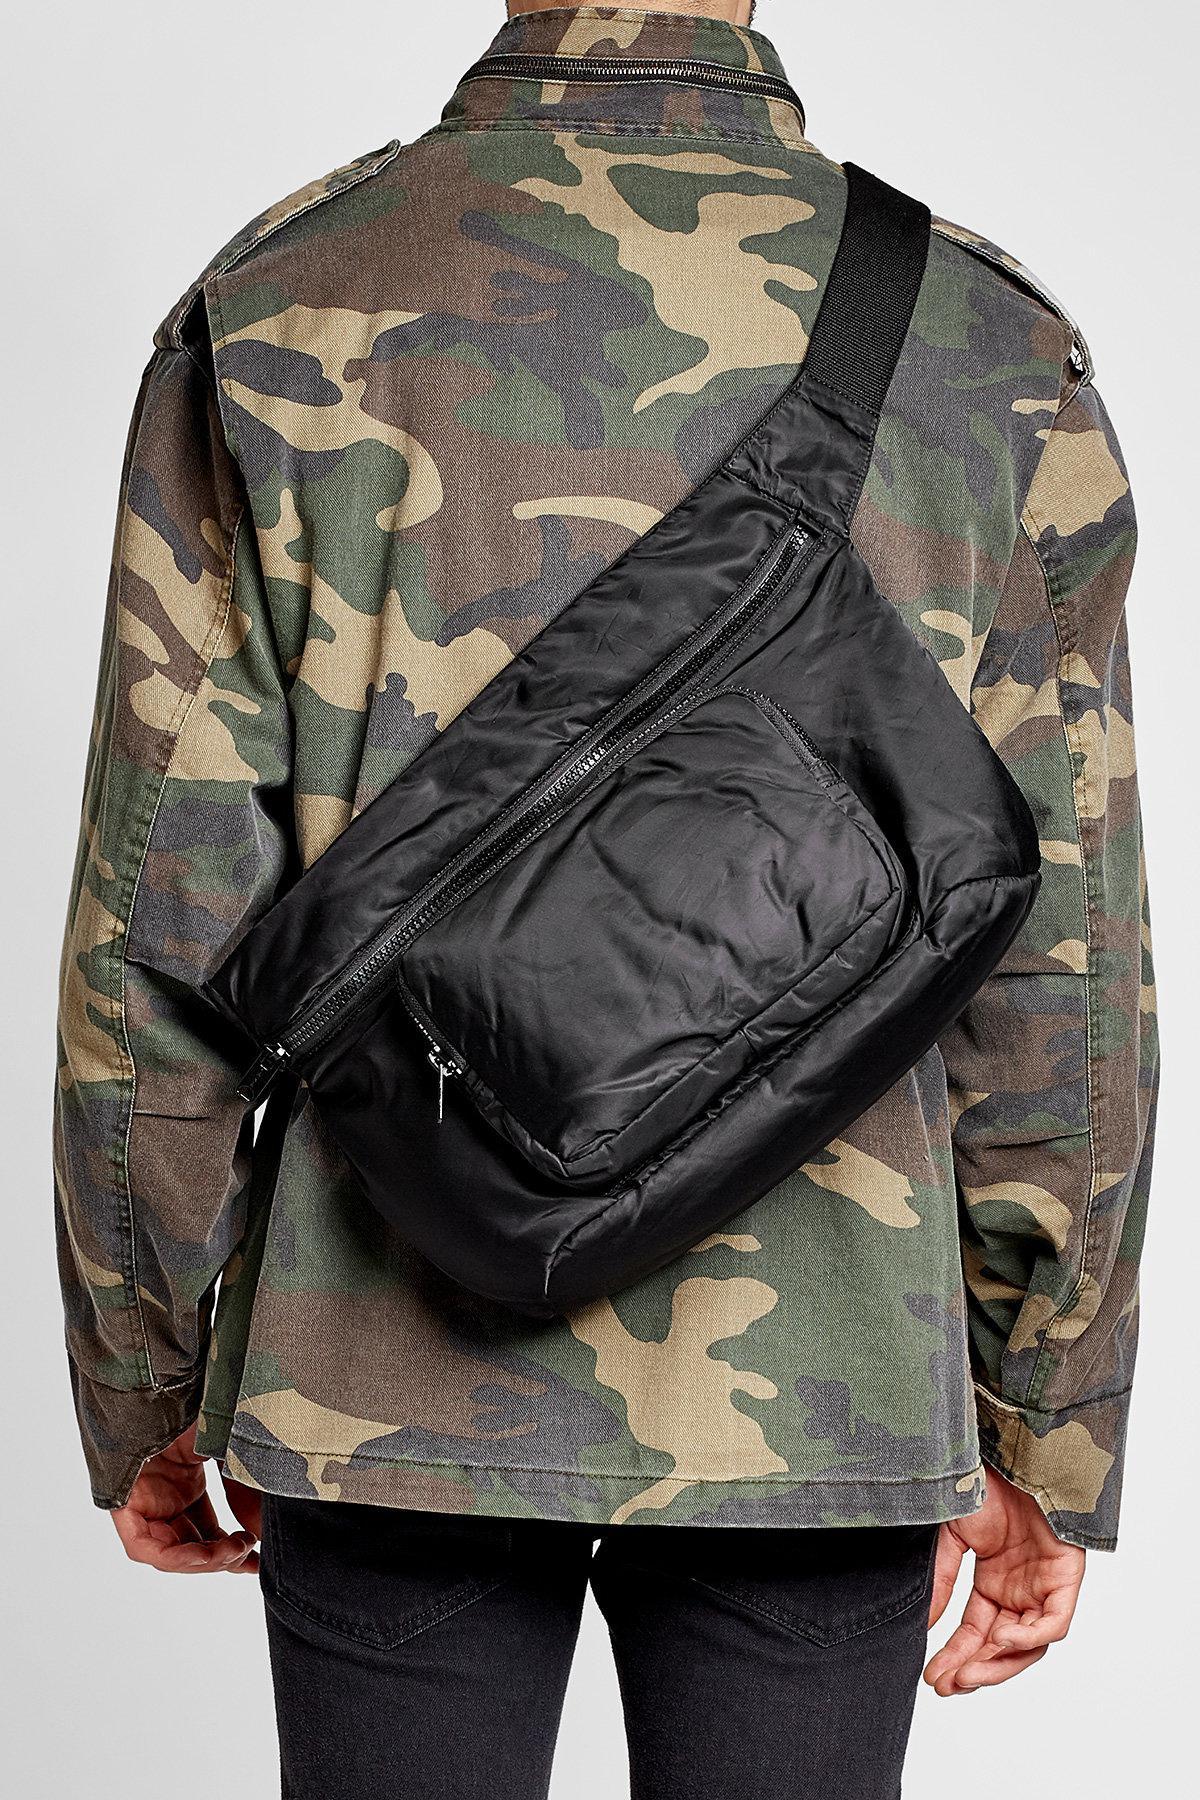 2307fc01b Yeezy Fabric Waist Bag in Black for Men - Lyst